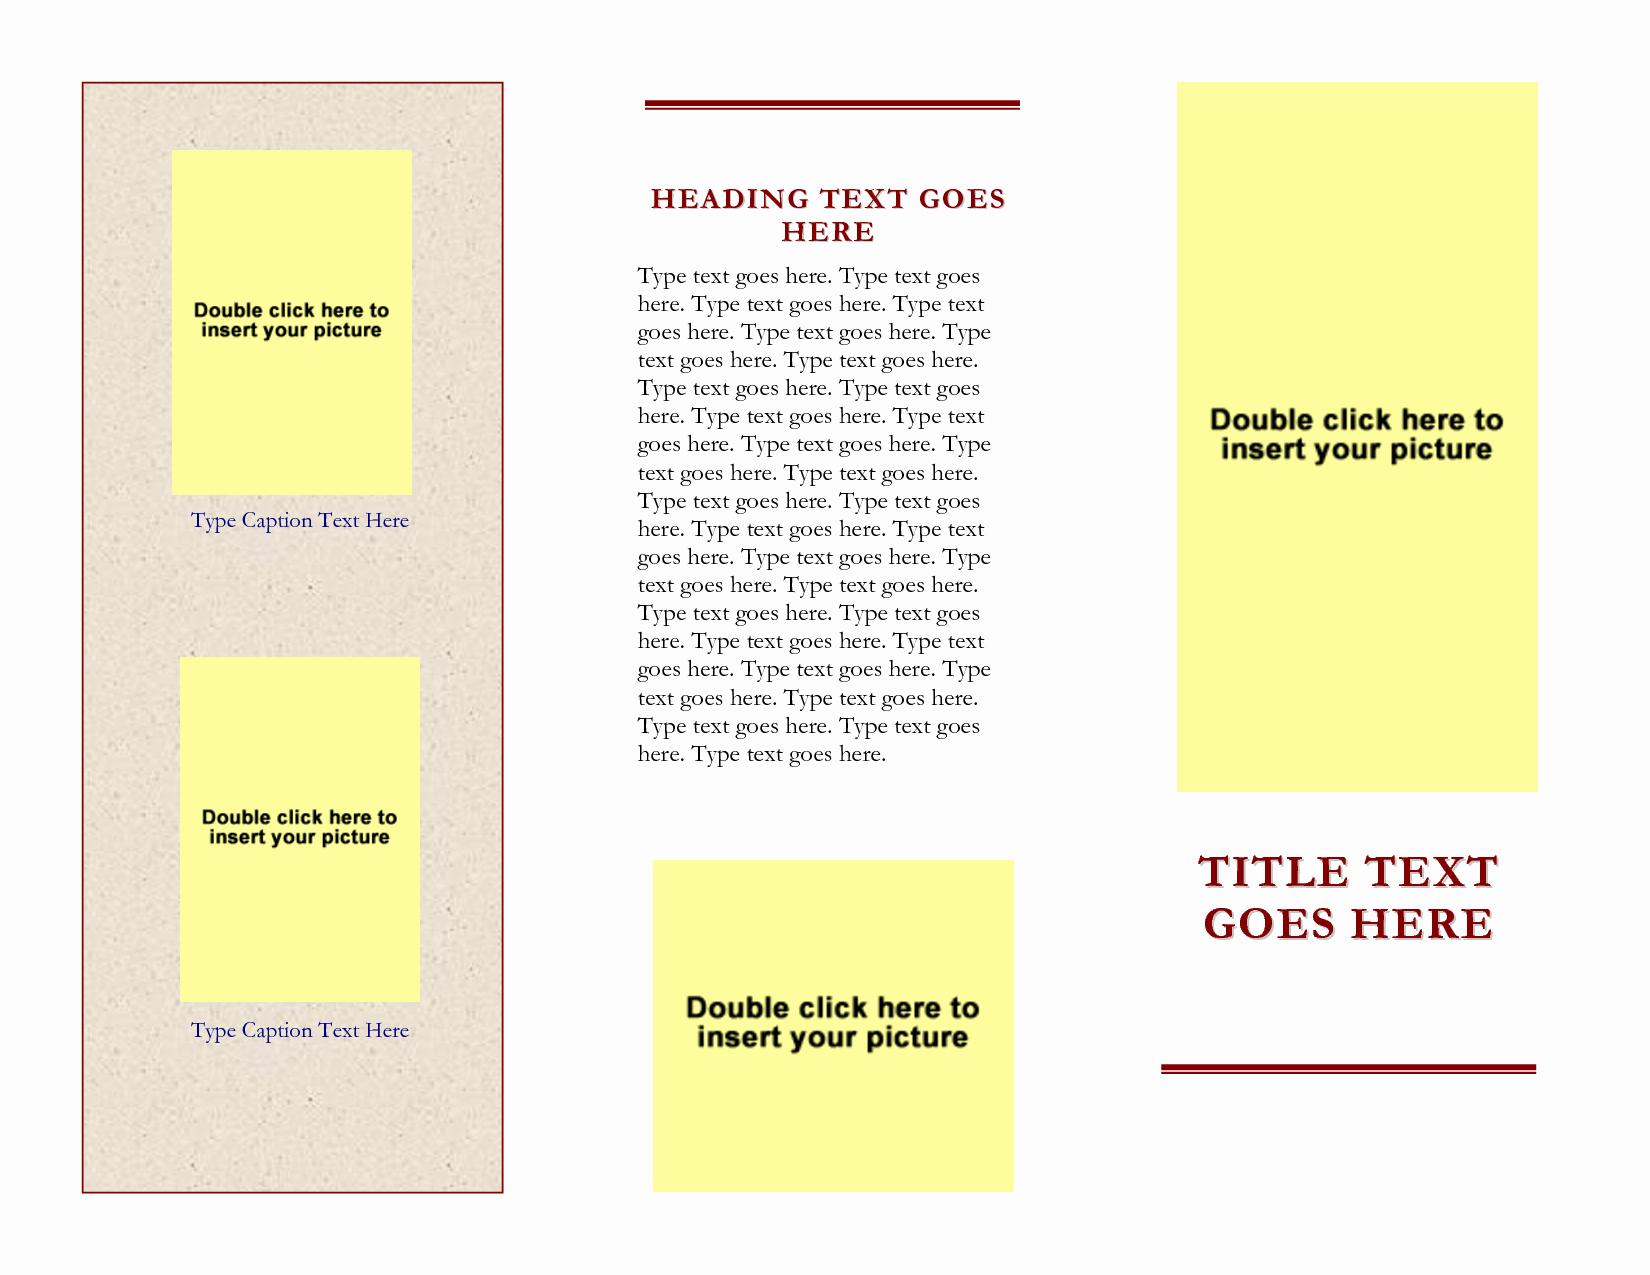 Microsoft Tri Fold Brochure Templates Awesome Free Tri Fold Brochure Templates for Word